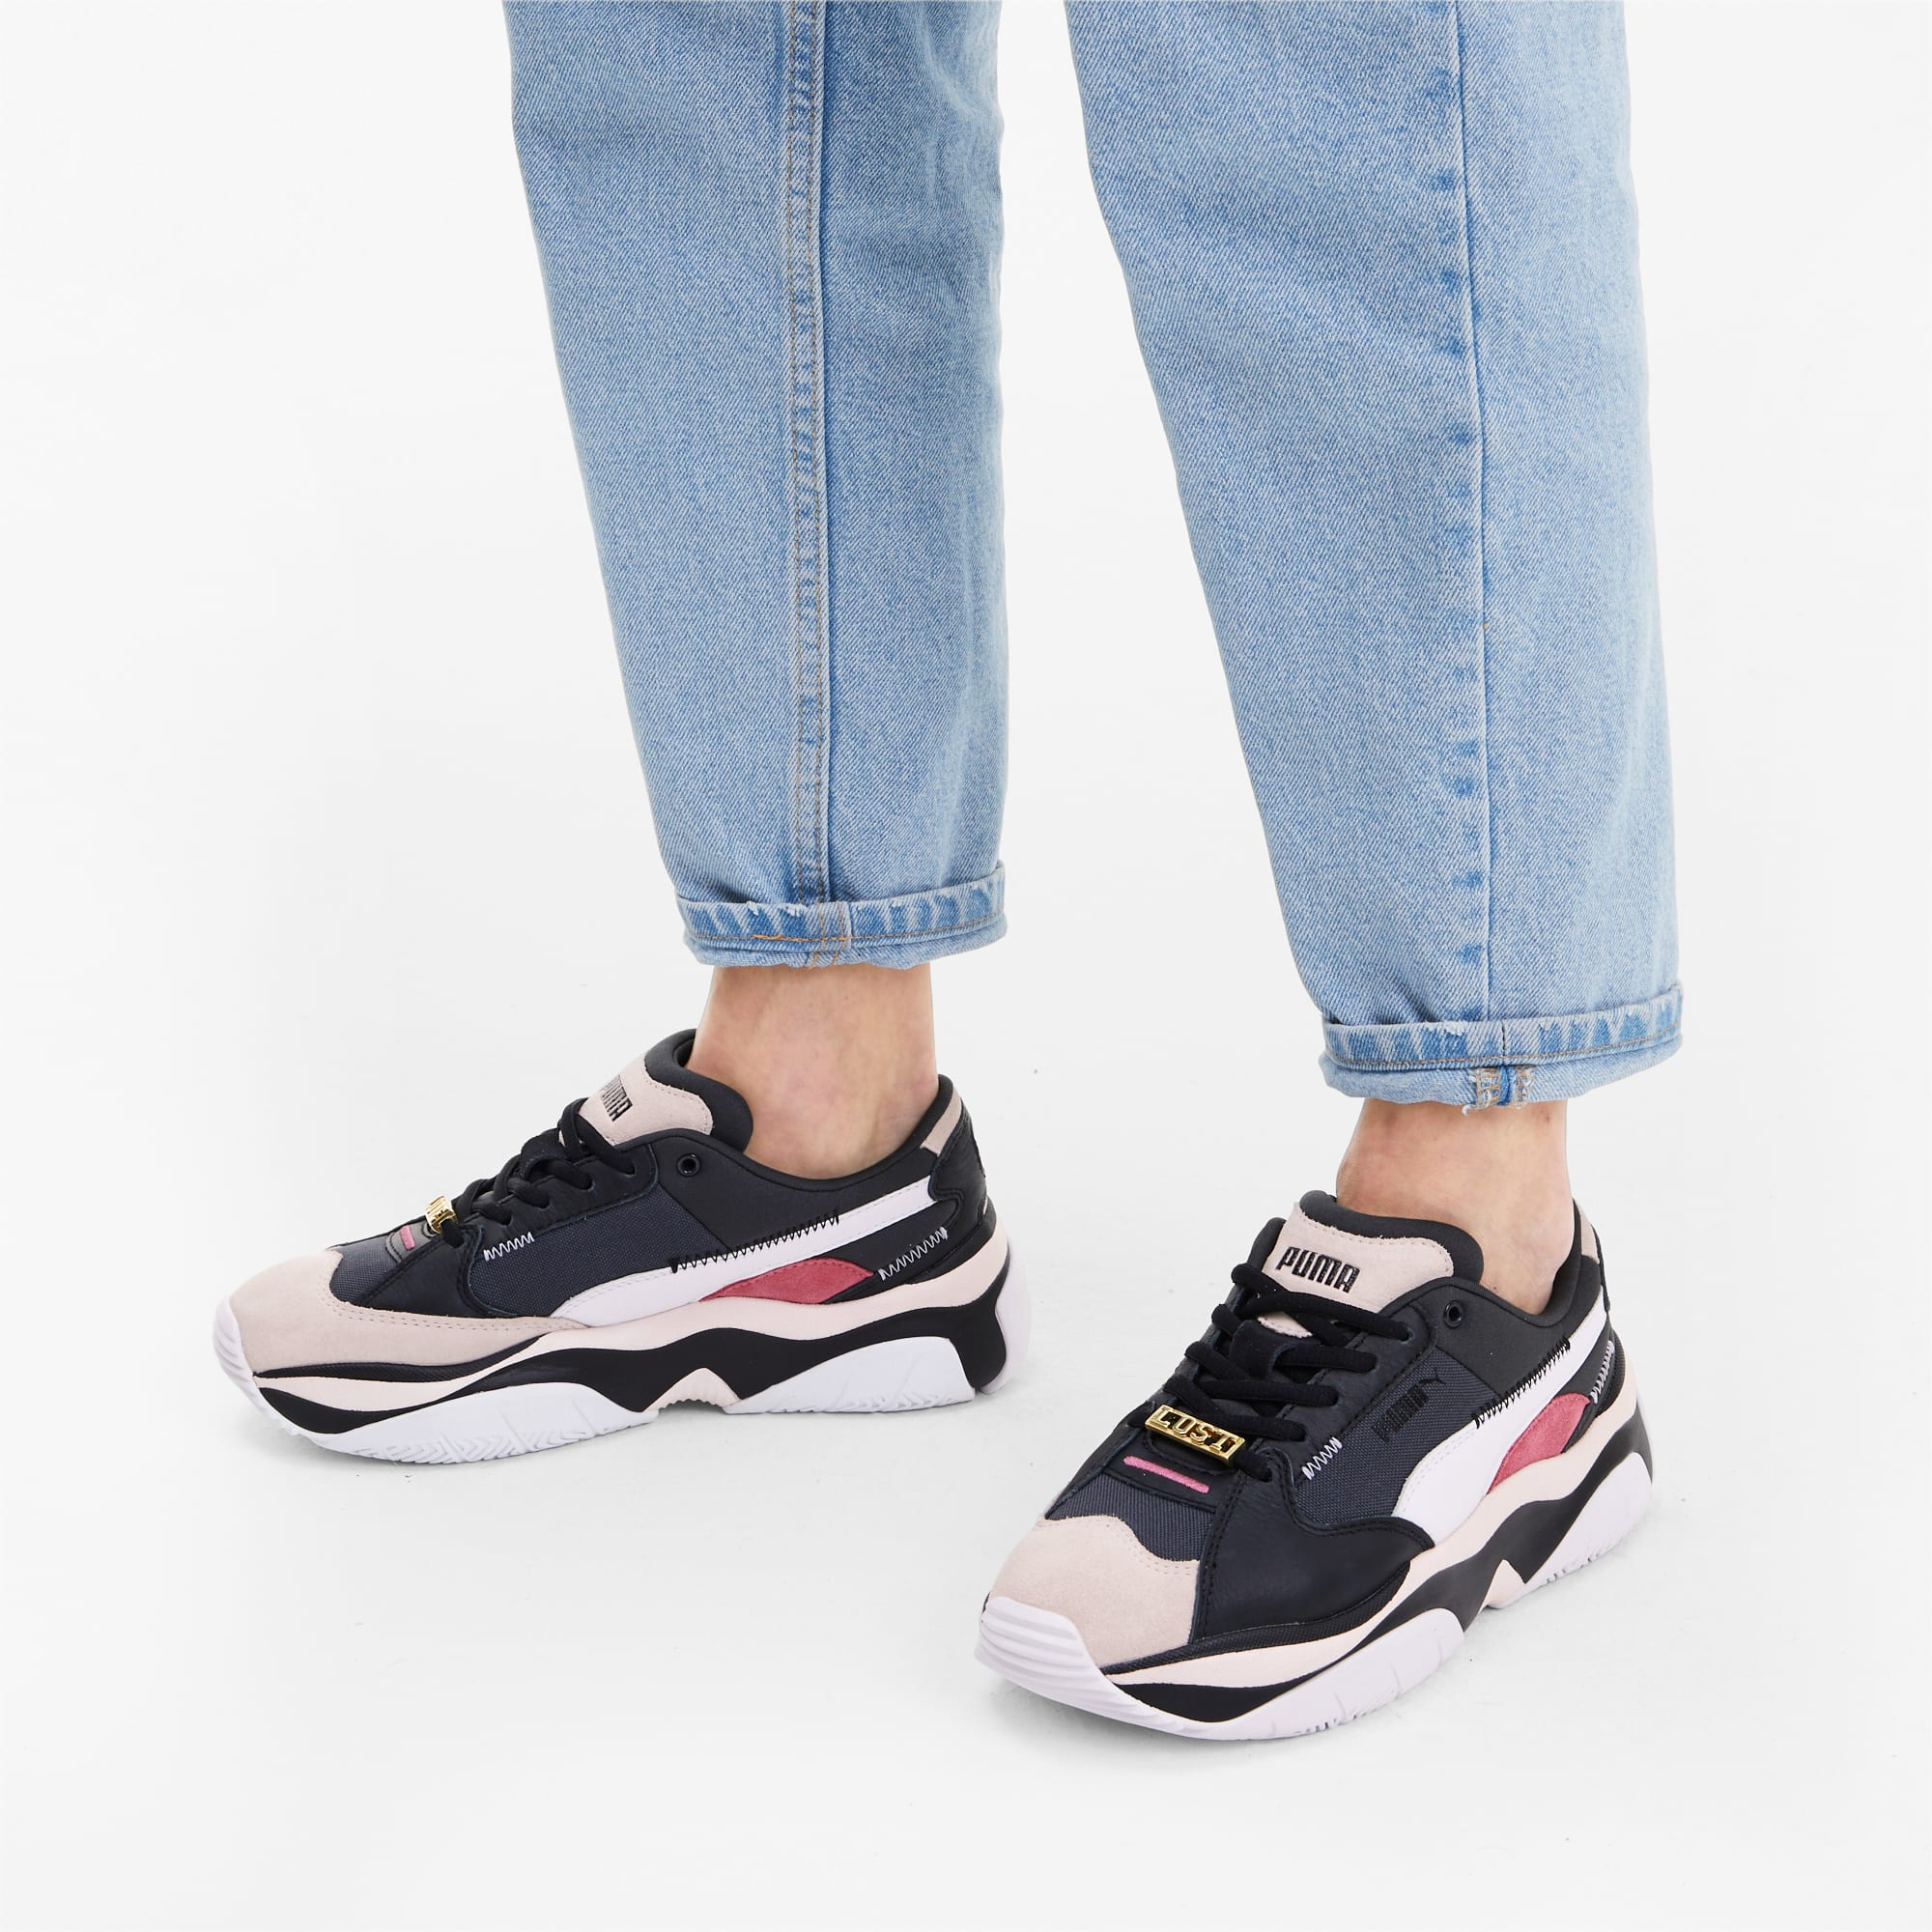 Storm Anti-Valentine's Day Women's Sneakers